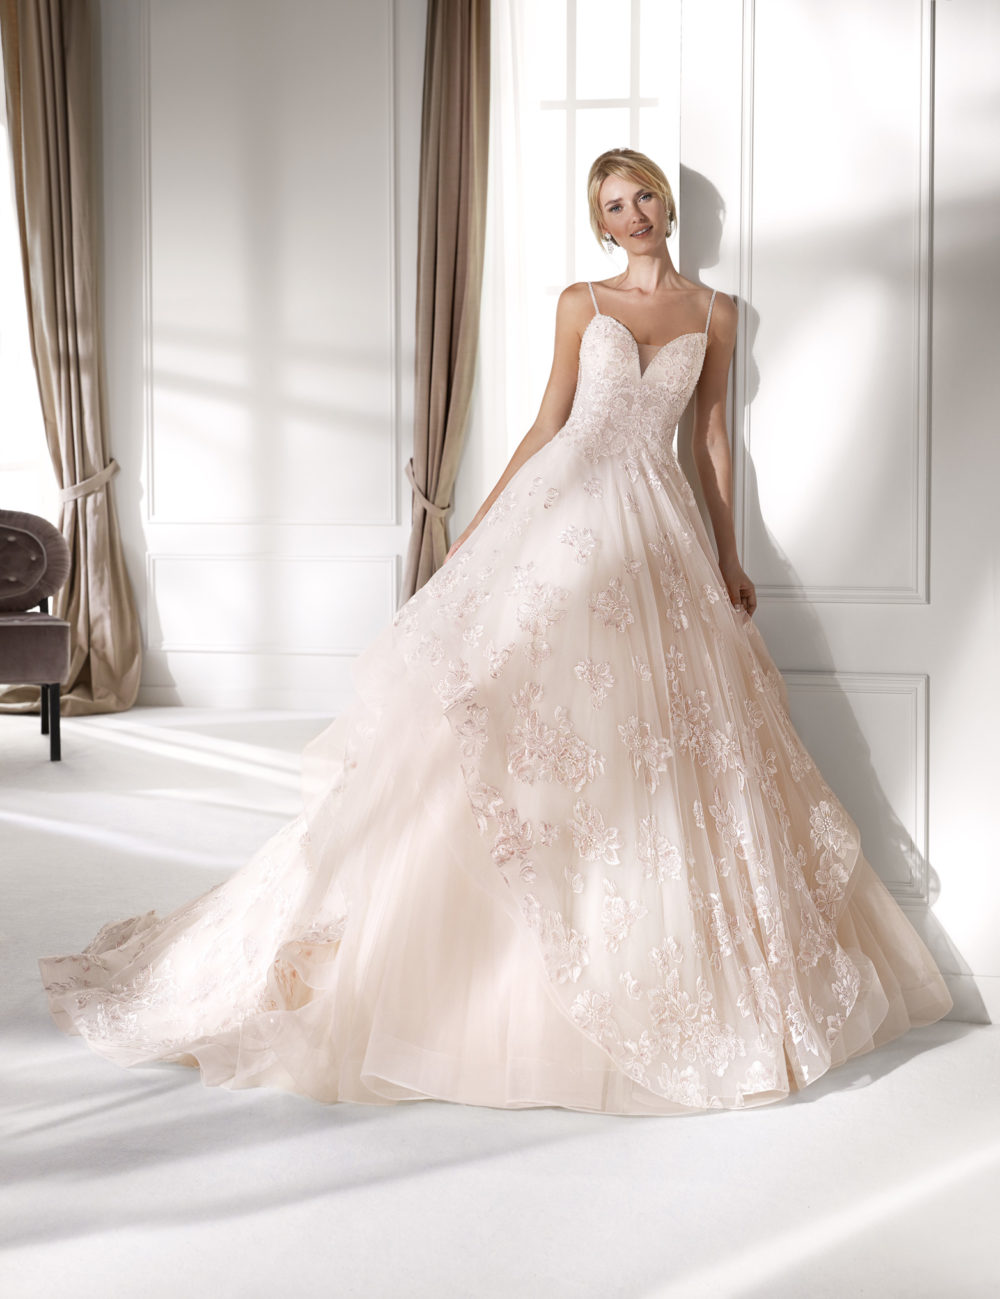 Mariages: abito da sposa Colet 2020 a Vicenza, Verona, Padova, Veneto NIA20361